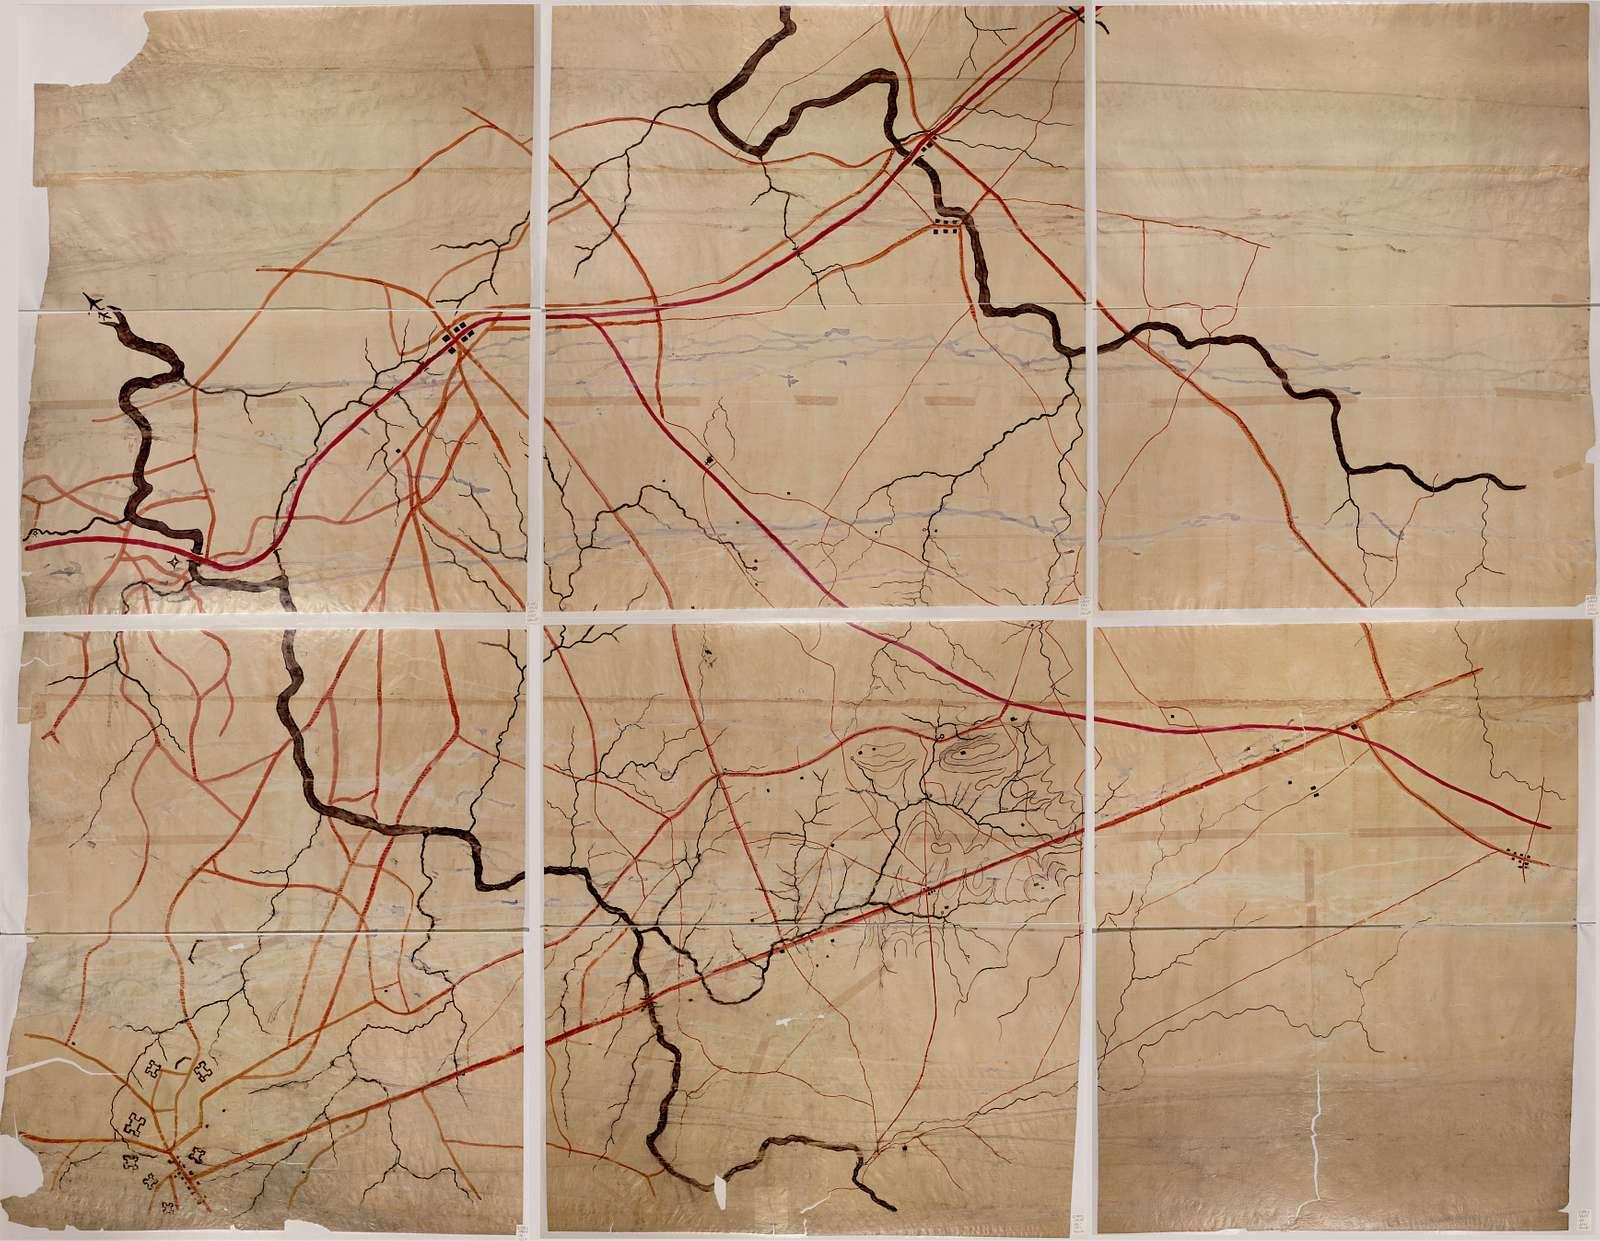 [Map of the Manassas battlefield area in Northern Virginia].